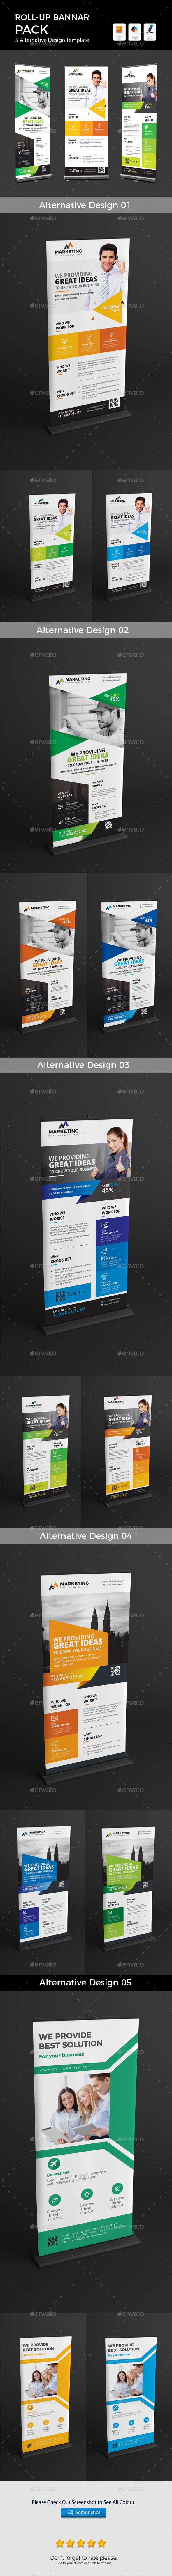 GraphicRiver Roll-Up 5 Alternative Design Template 21158103